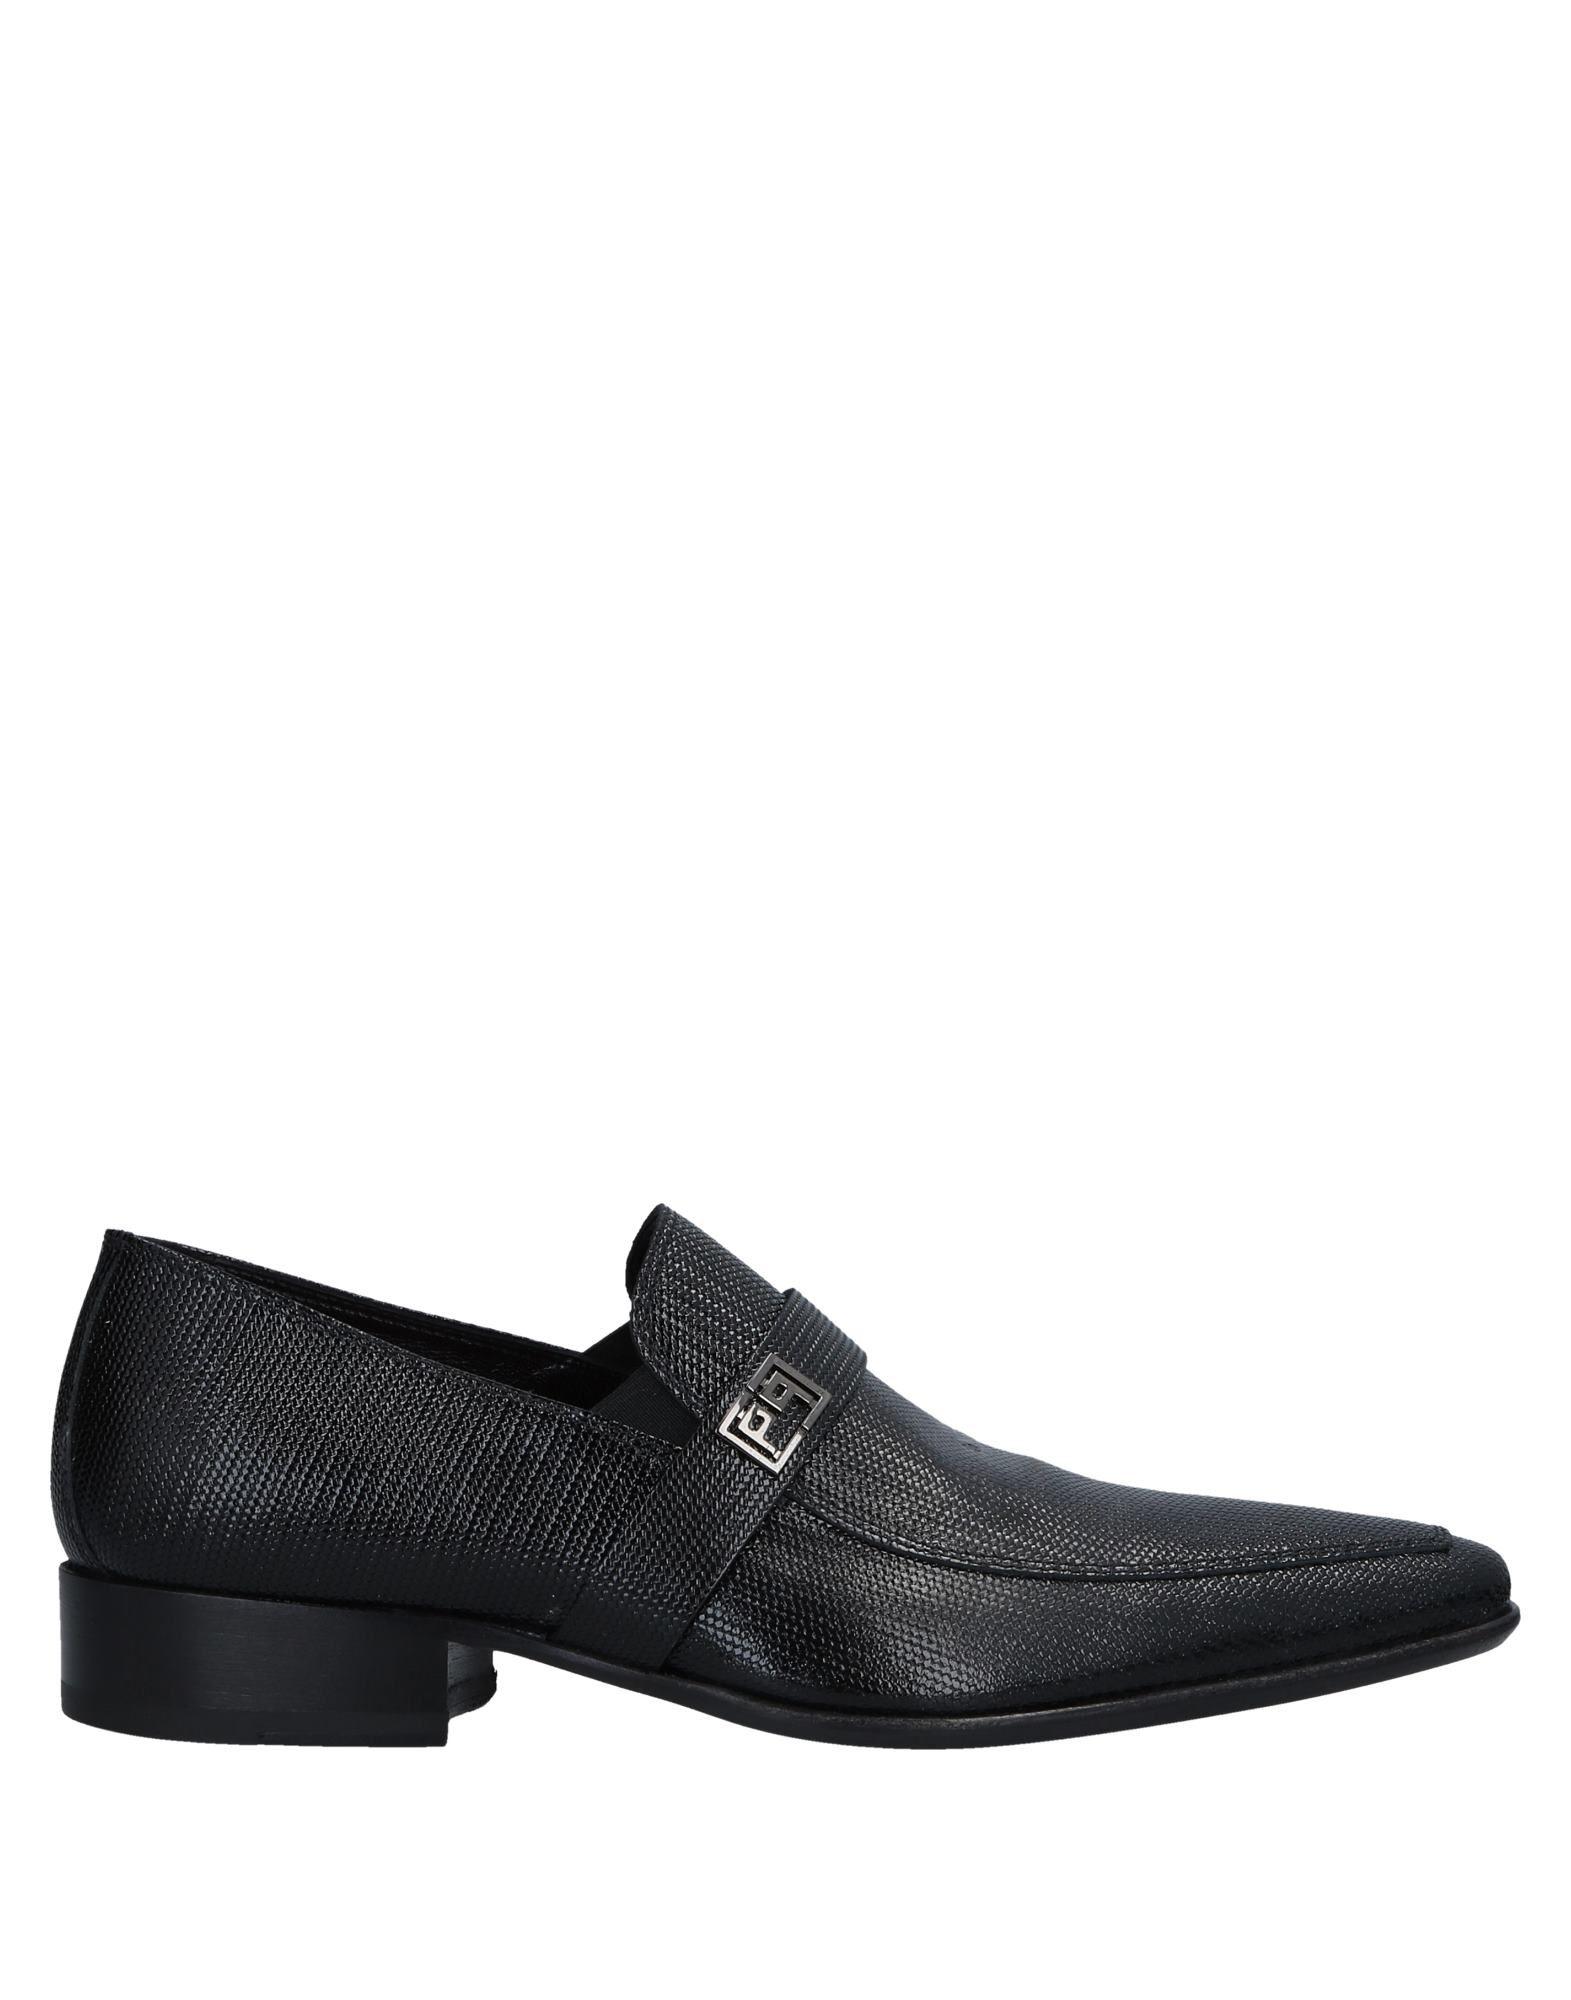 Carlo Pignatelli Outside Mokassins Herren  11535218IW Gute Qualität beliebte Schuhe